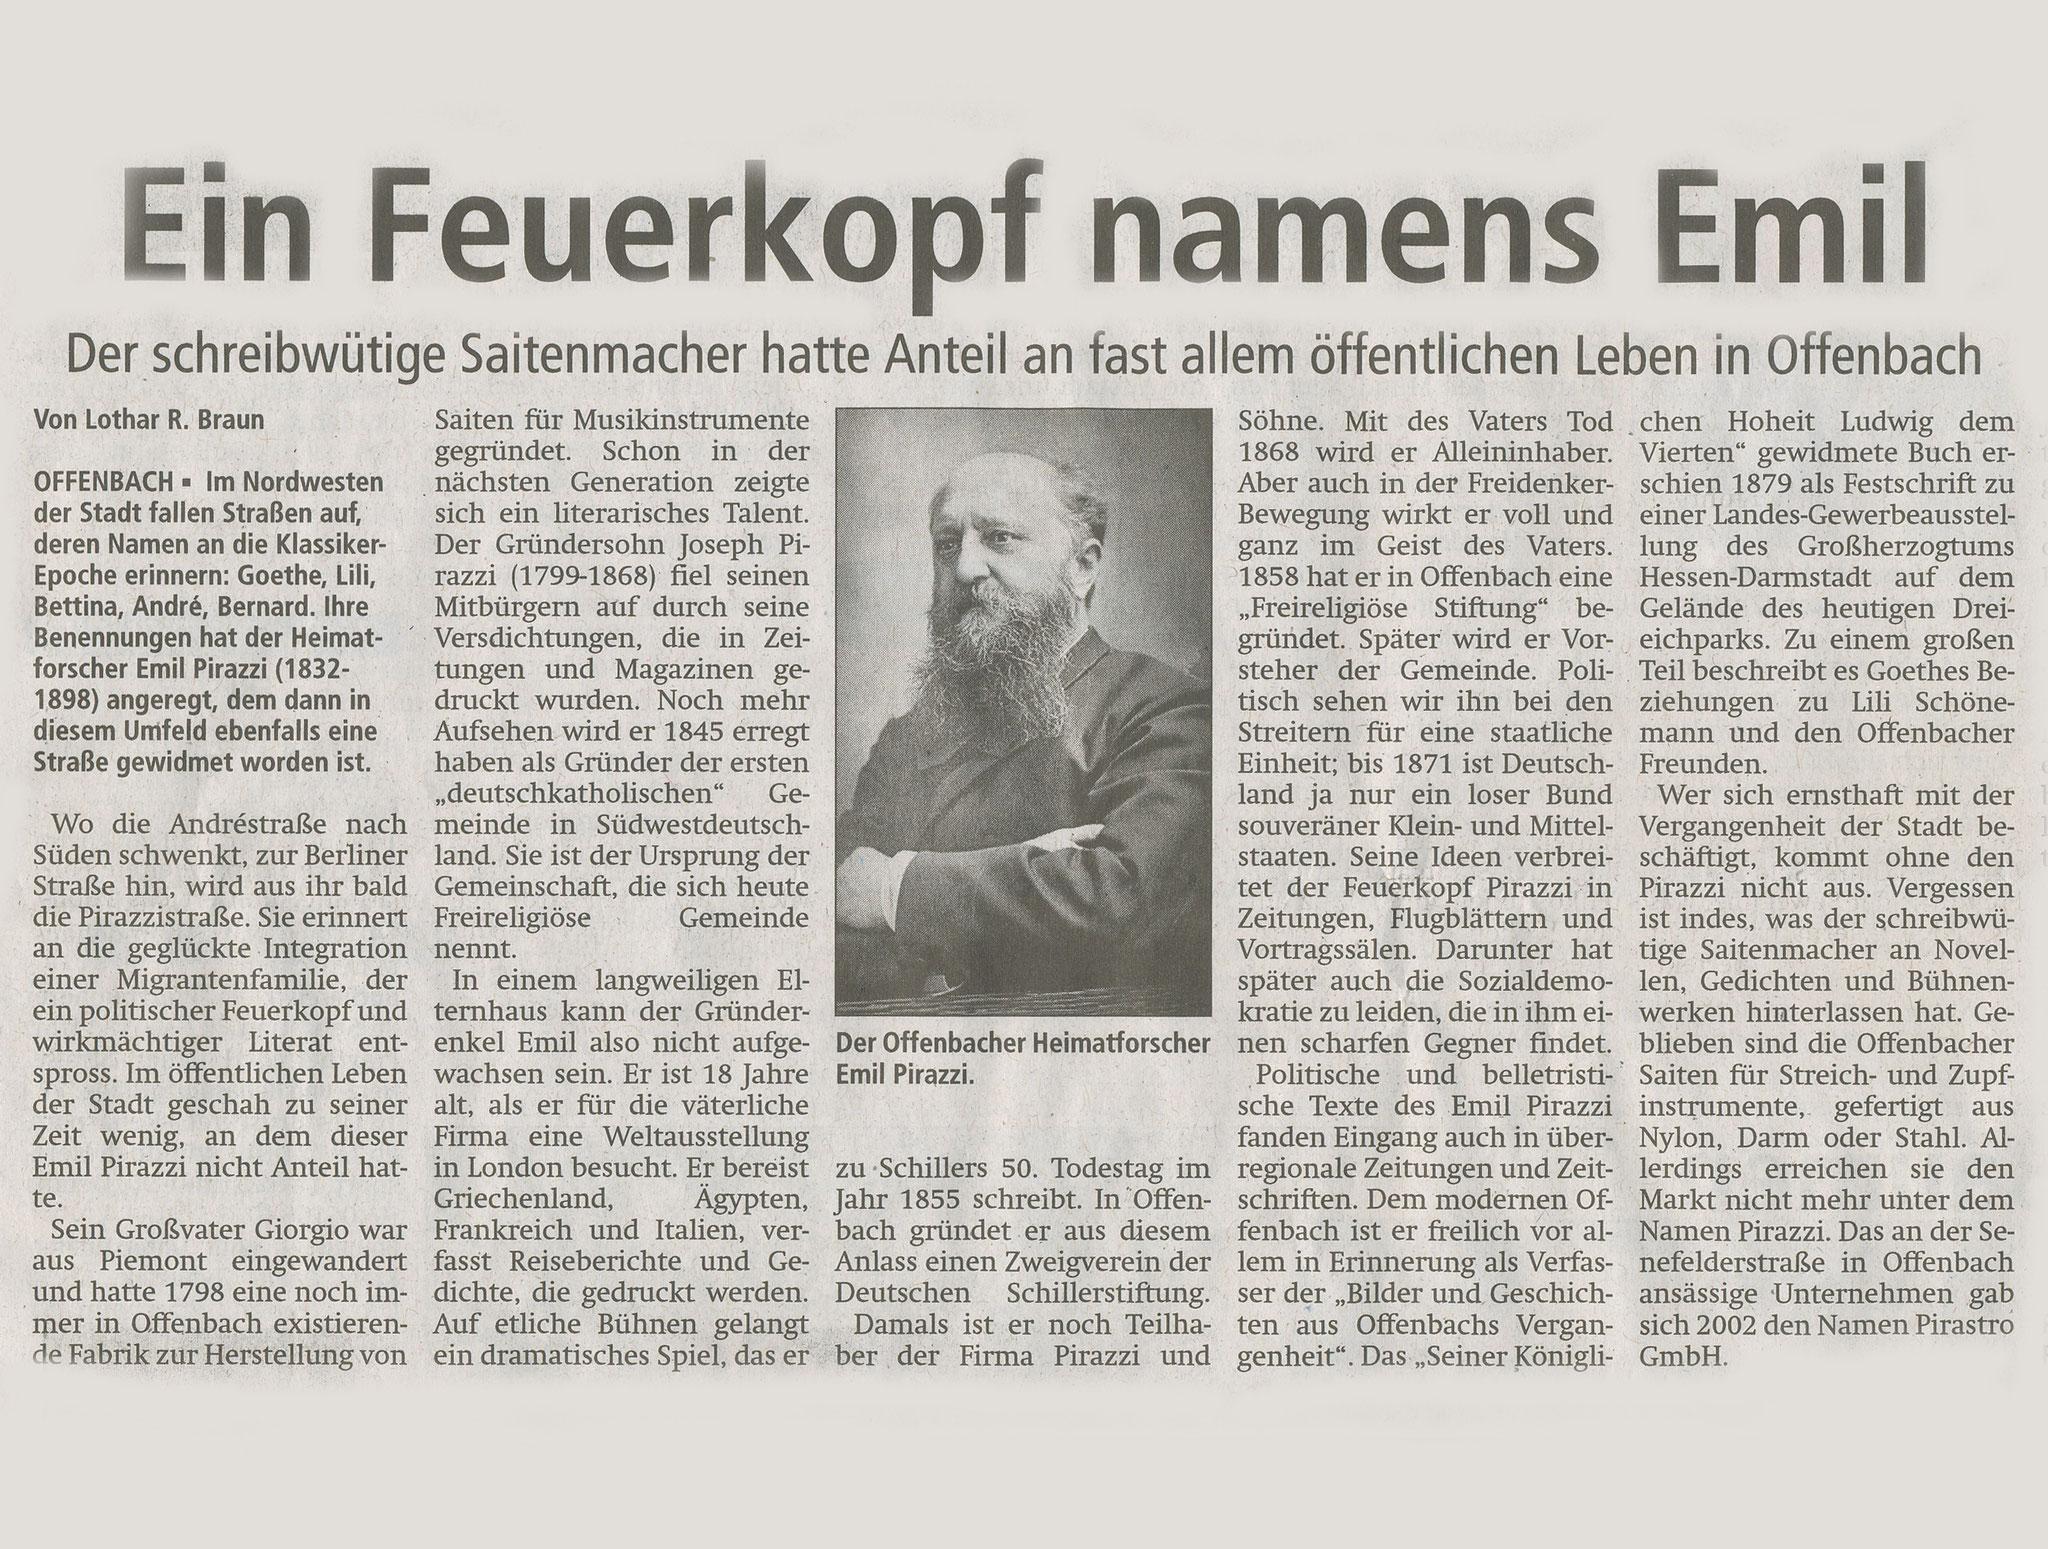 Offenbach Post, 13. Februar 2017